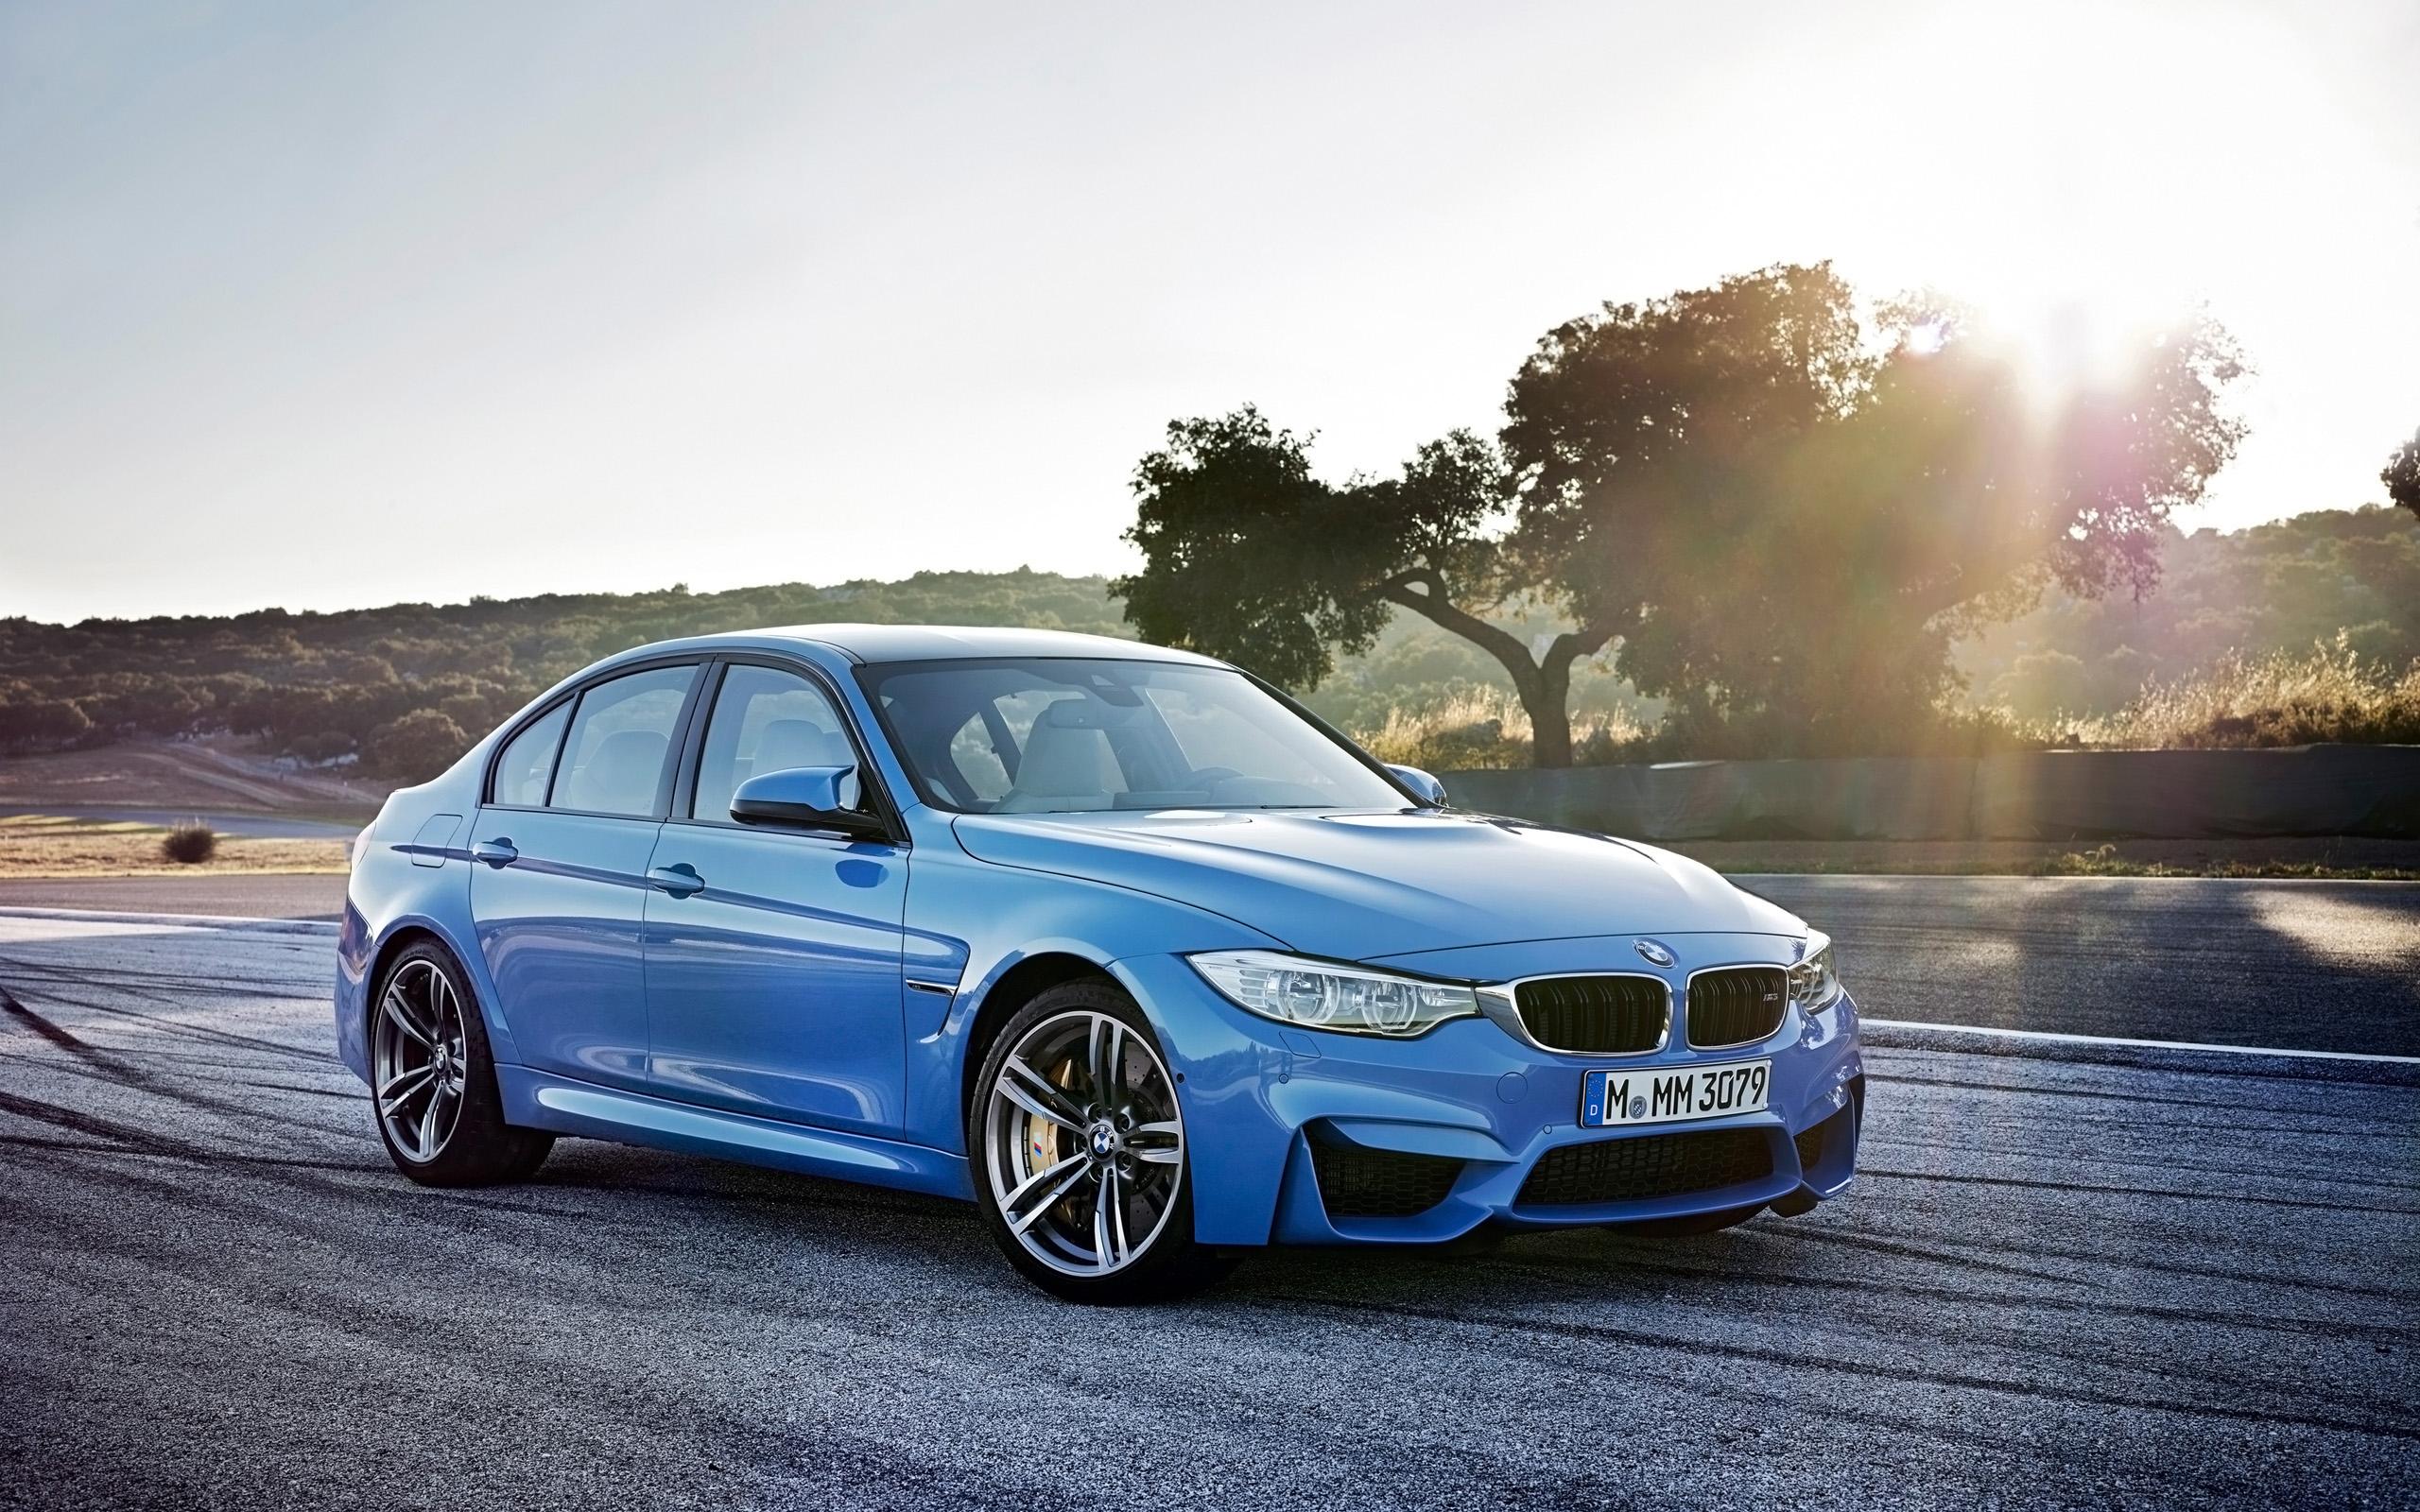 2014 BMW M3 Sedan Wallpaper HD Car Wallpapers 2560x1600